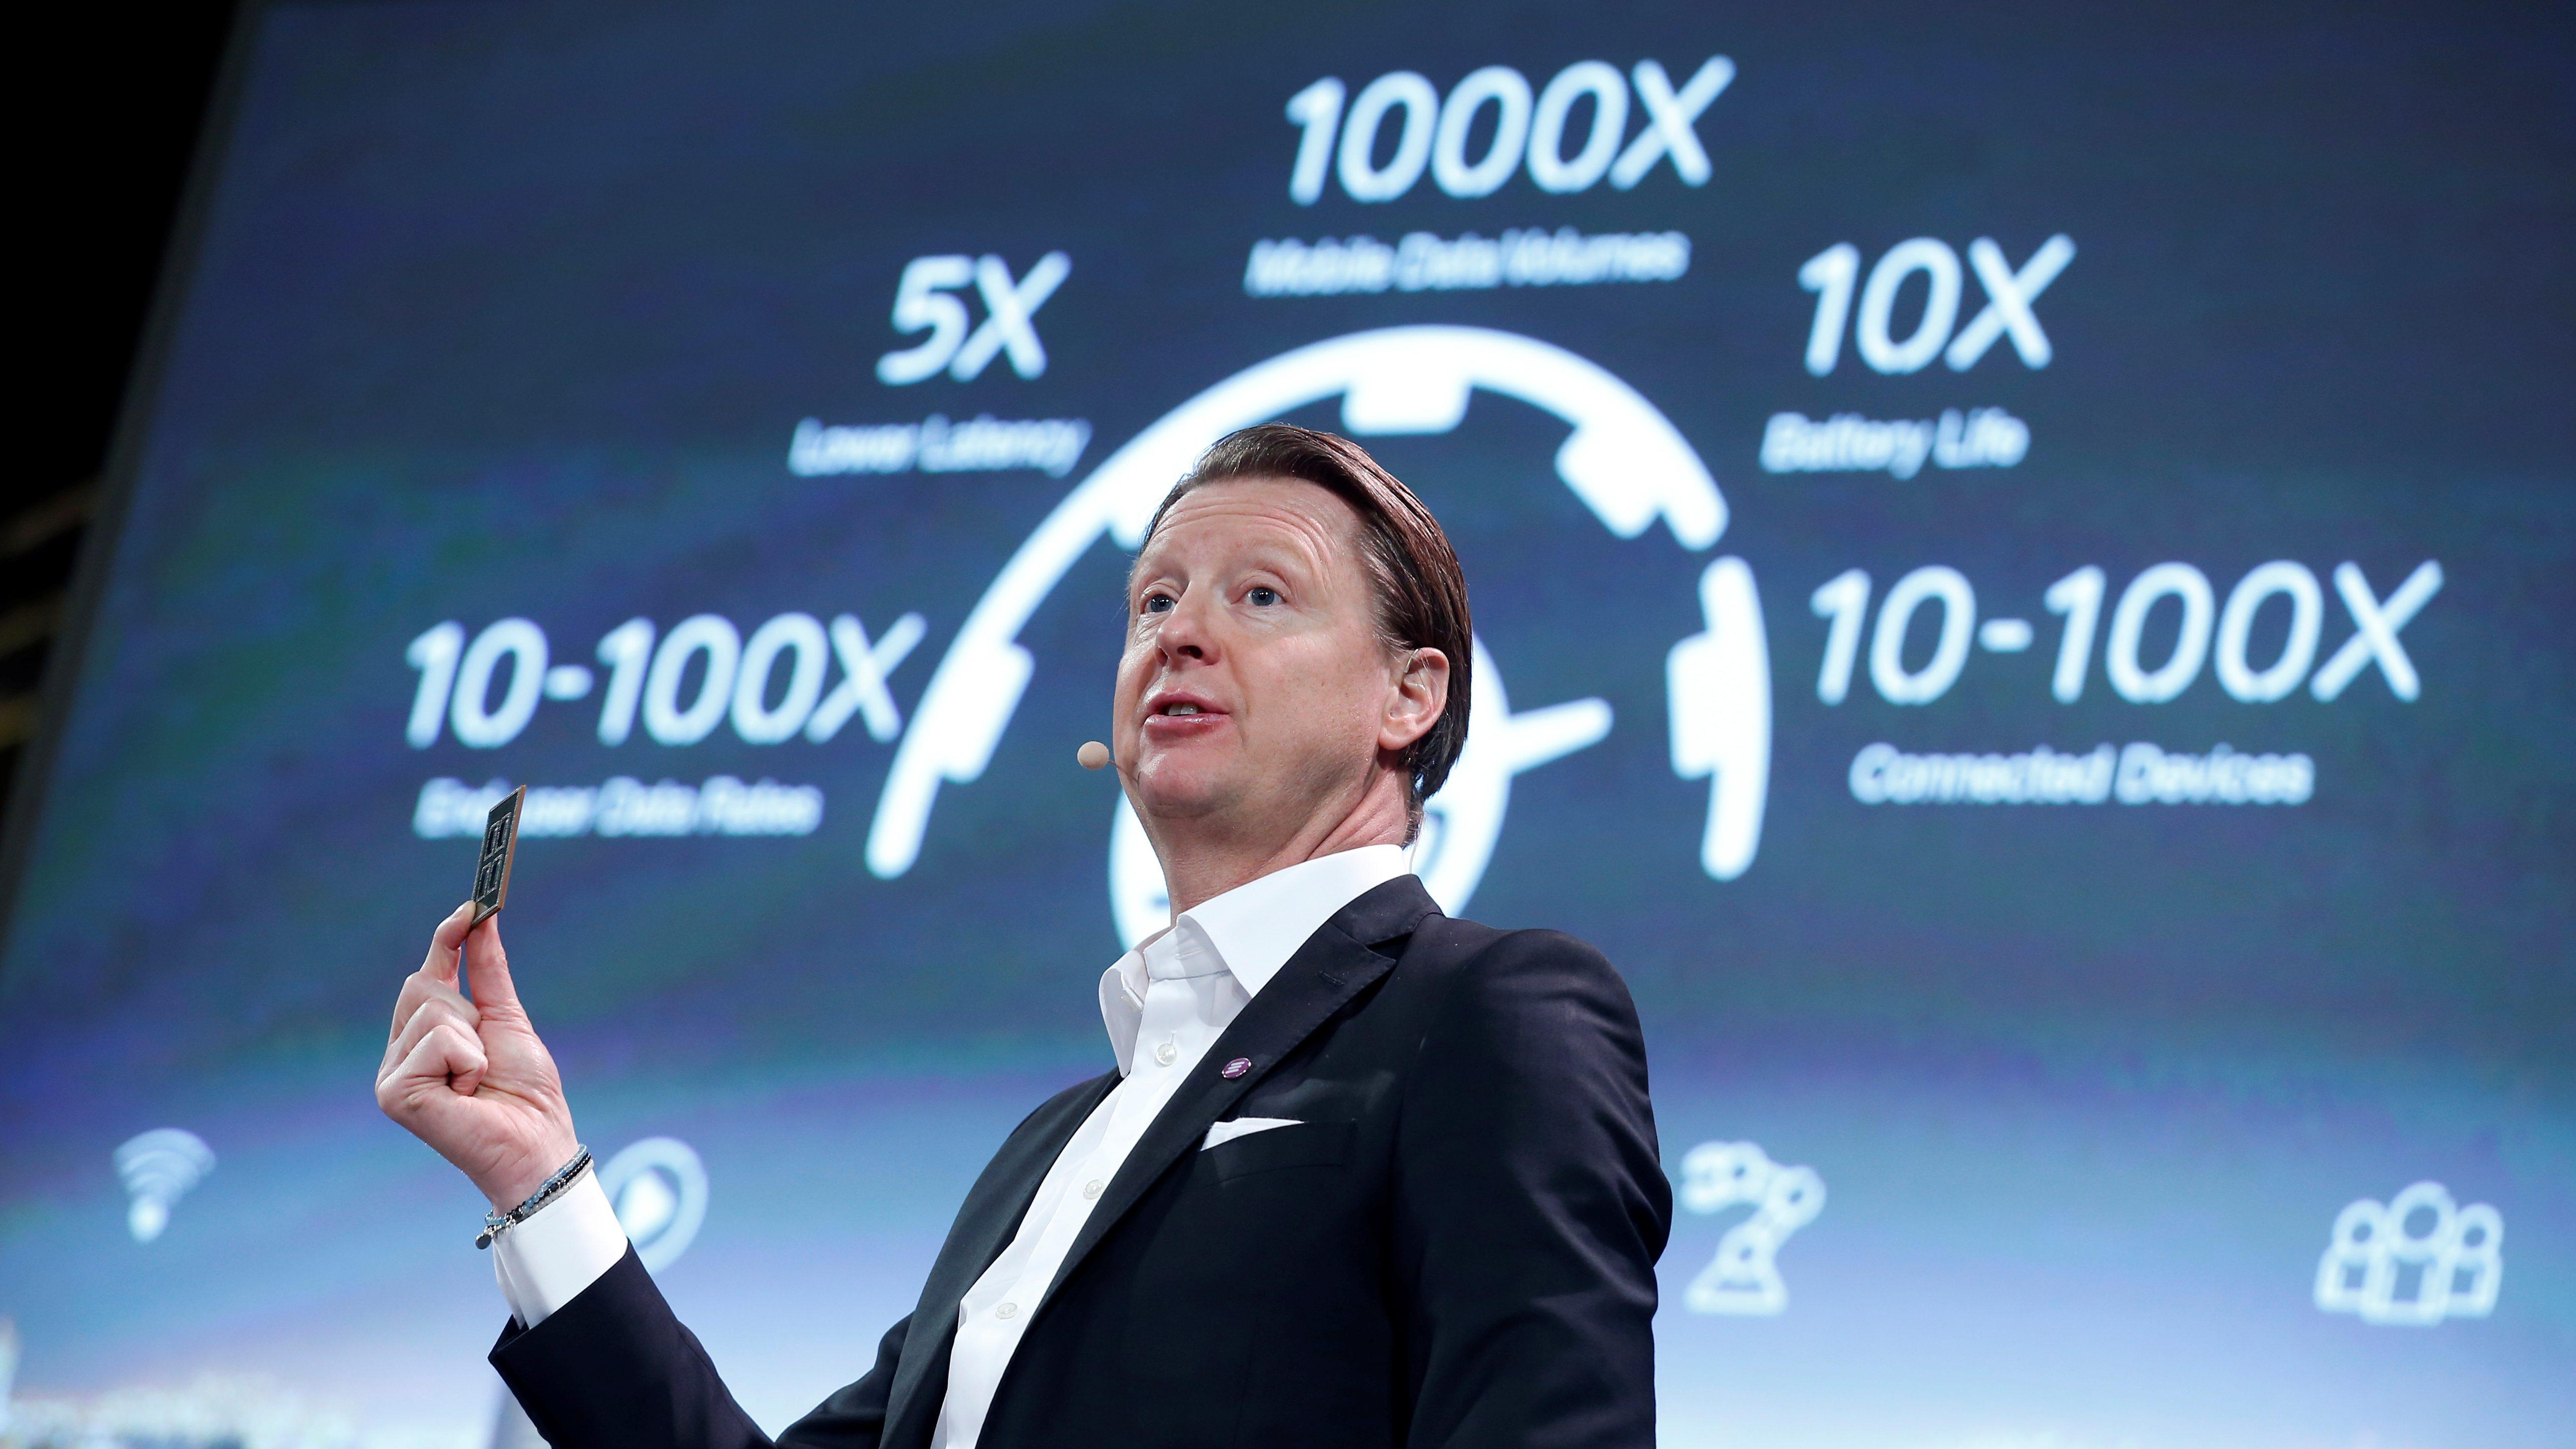 Ericsson's then-president & CEO Hans Vestberg shows a 5G chip